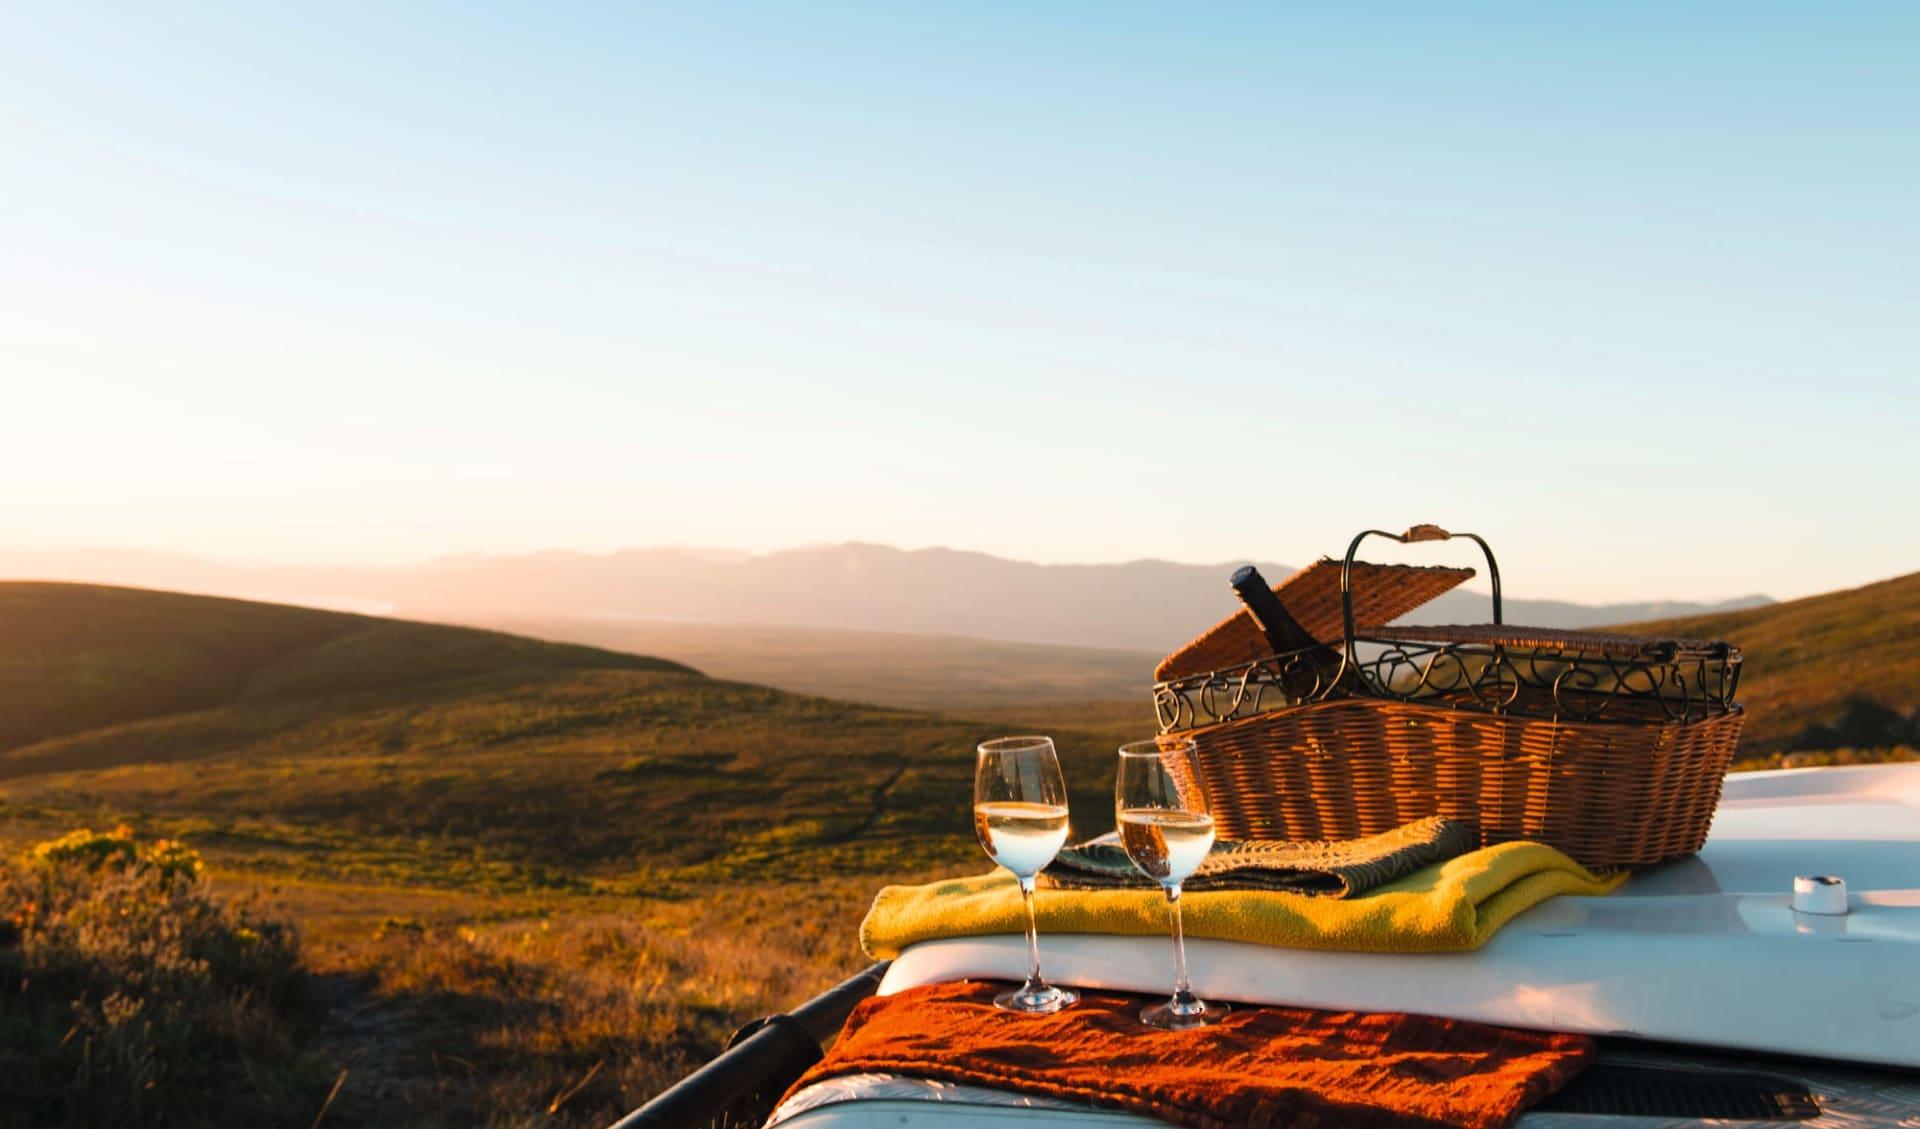 South Africa's Secrets ab Kapstadt: fb Grootbos Private Nature Reserve Picknickkorb mit zwei Weingläser